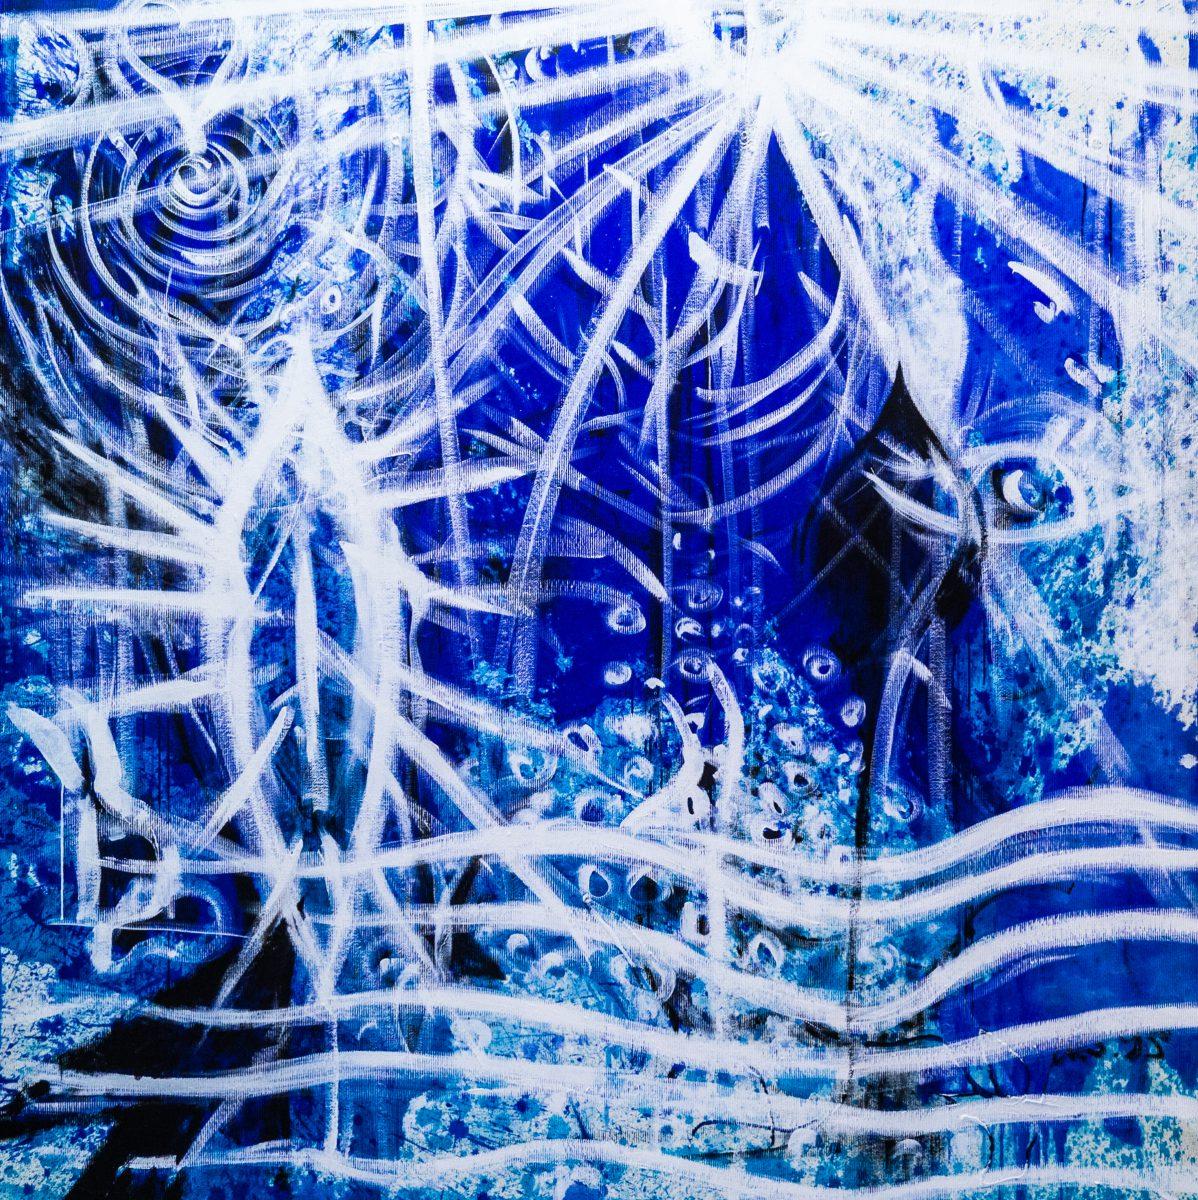 030_Stargate, Acryl auf Zellstoff, 182 x 182 cm, 2010